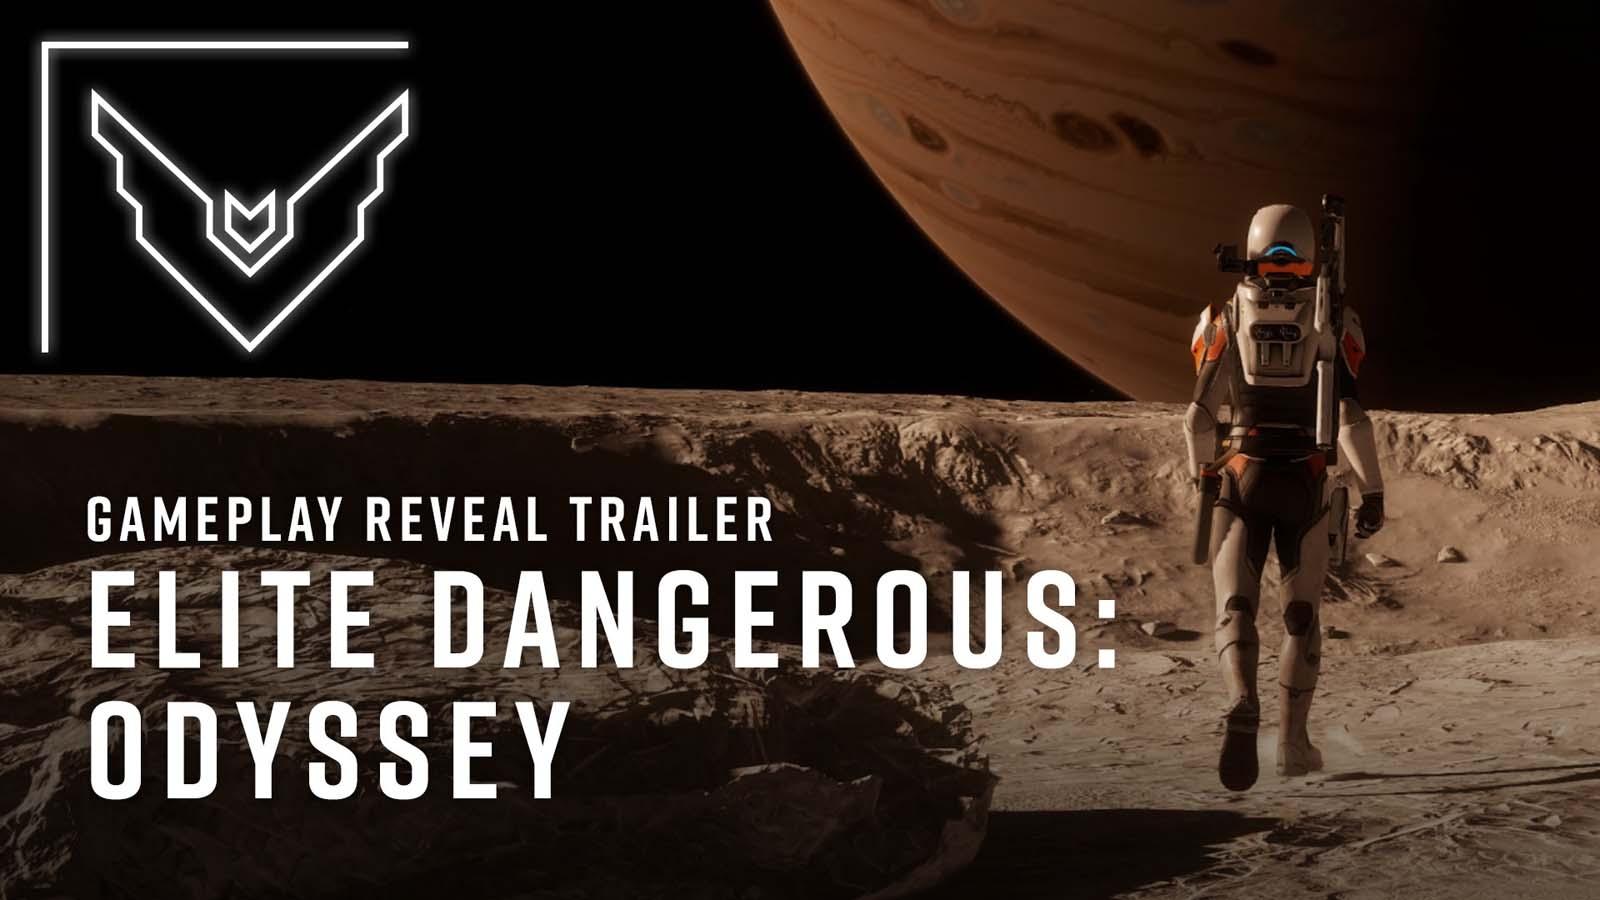 Watch the Elite Dangerous Odyssey gameplay reveal trailer